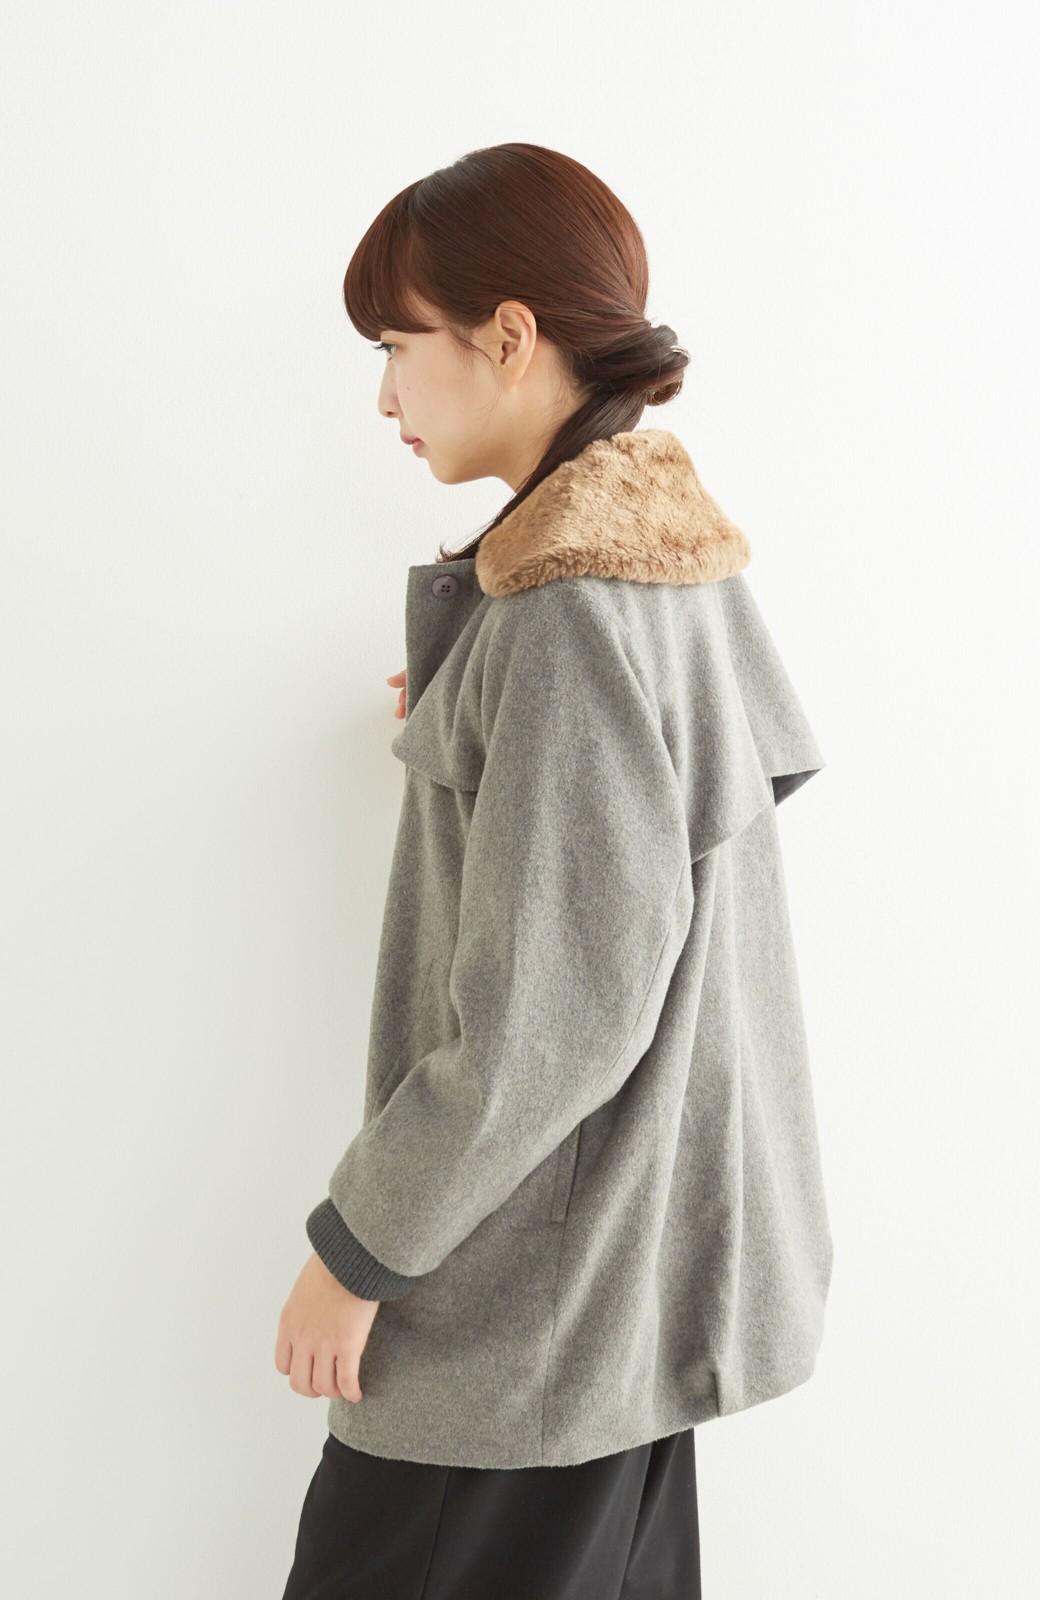 pilvee 取り外しフェイクファー衿付き ウール混のノーカラーコート <グレー>の商品写真19